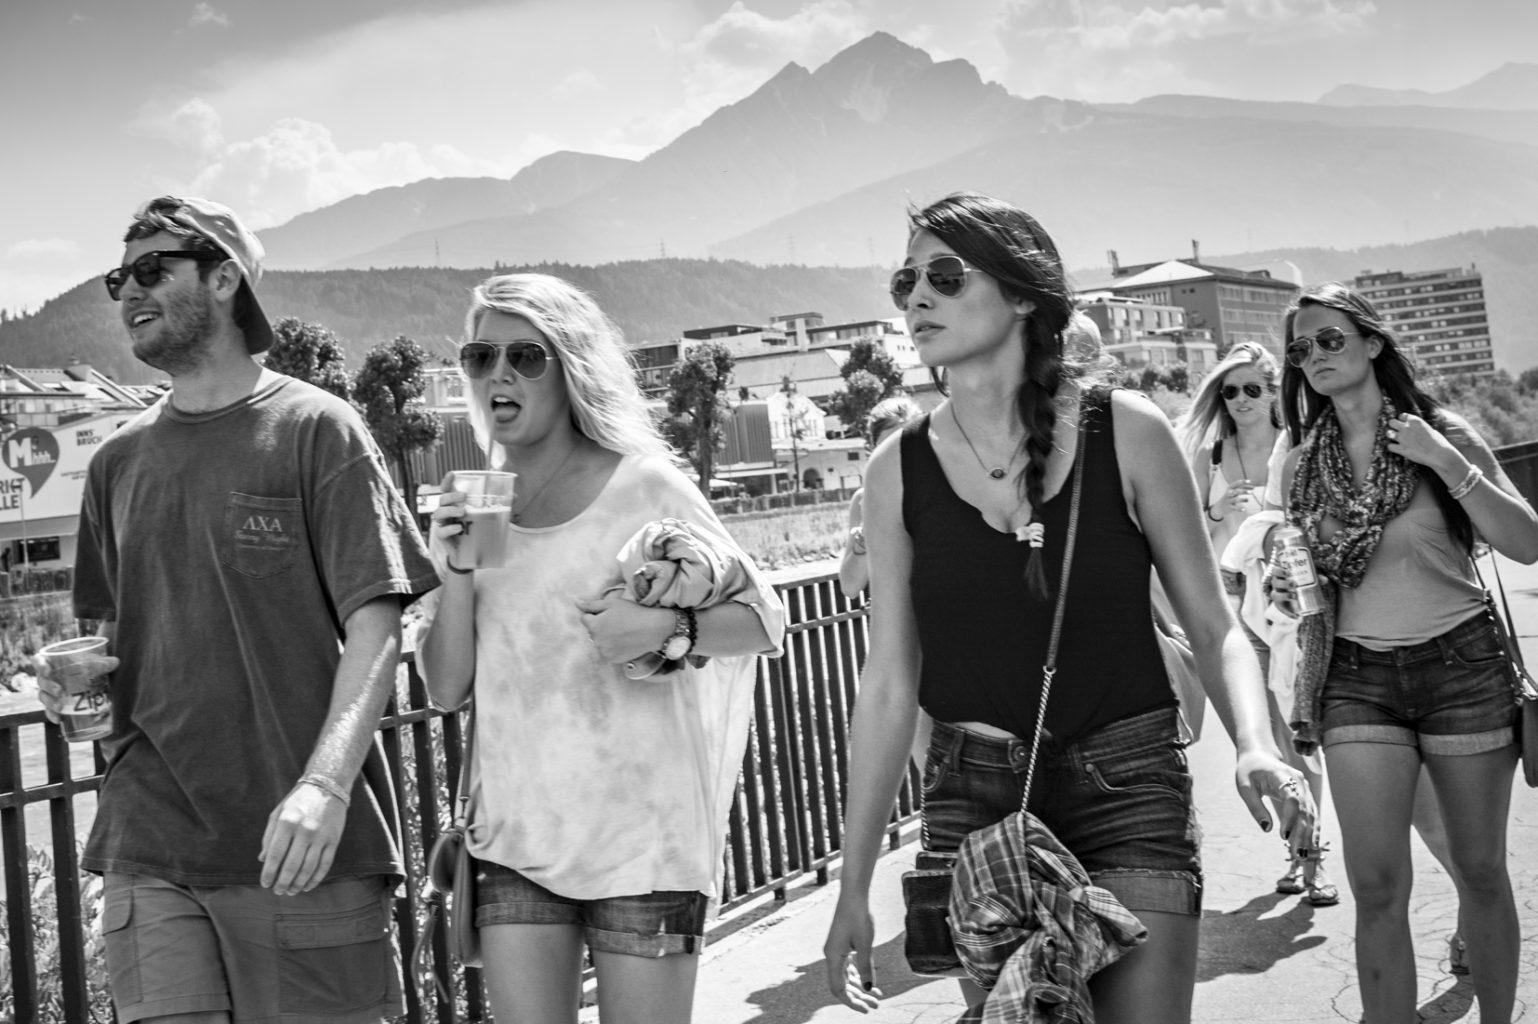 Hyperreal, Innsbruck, 22. Juli 2013